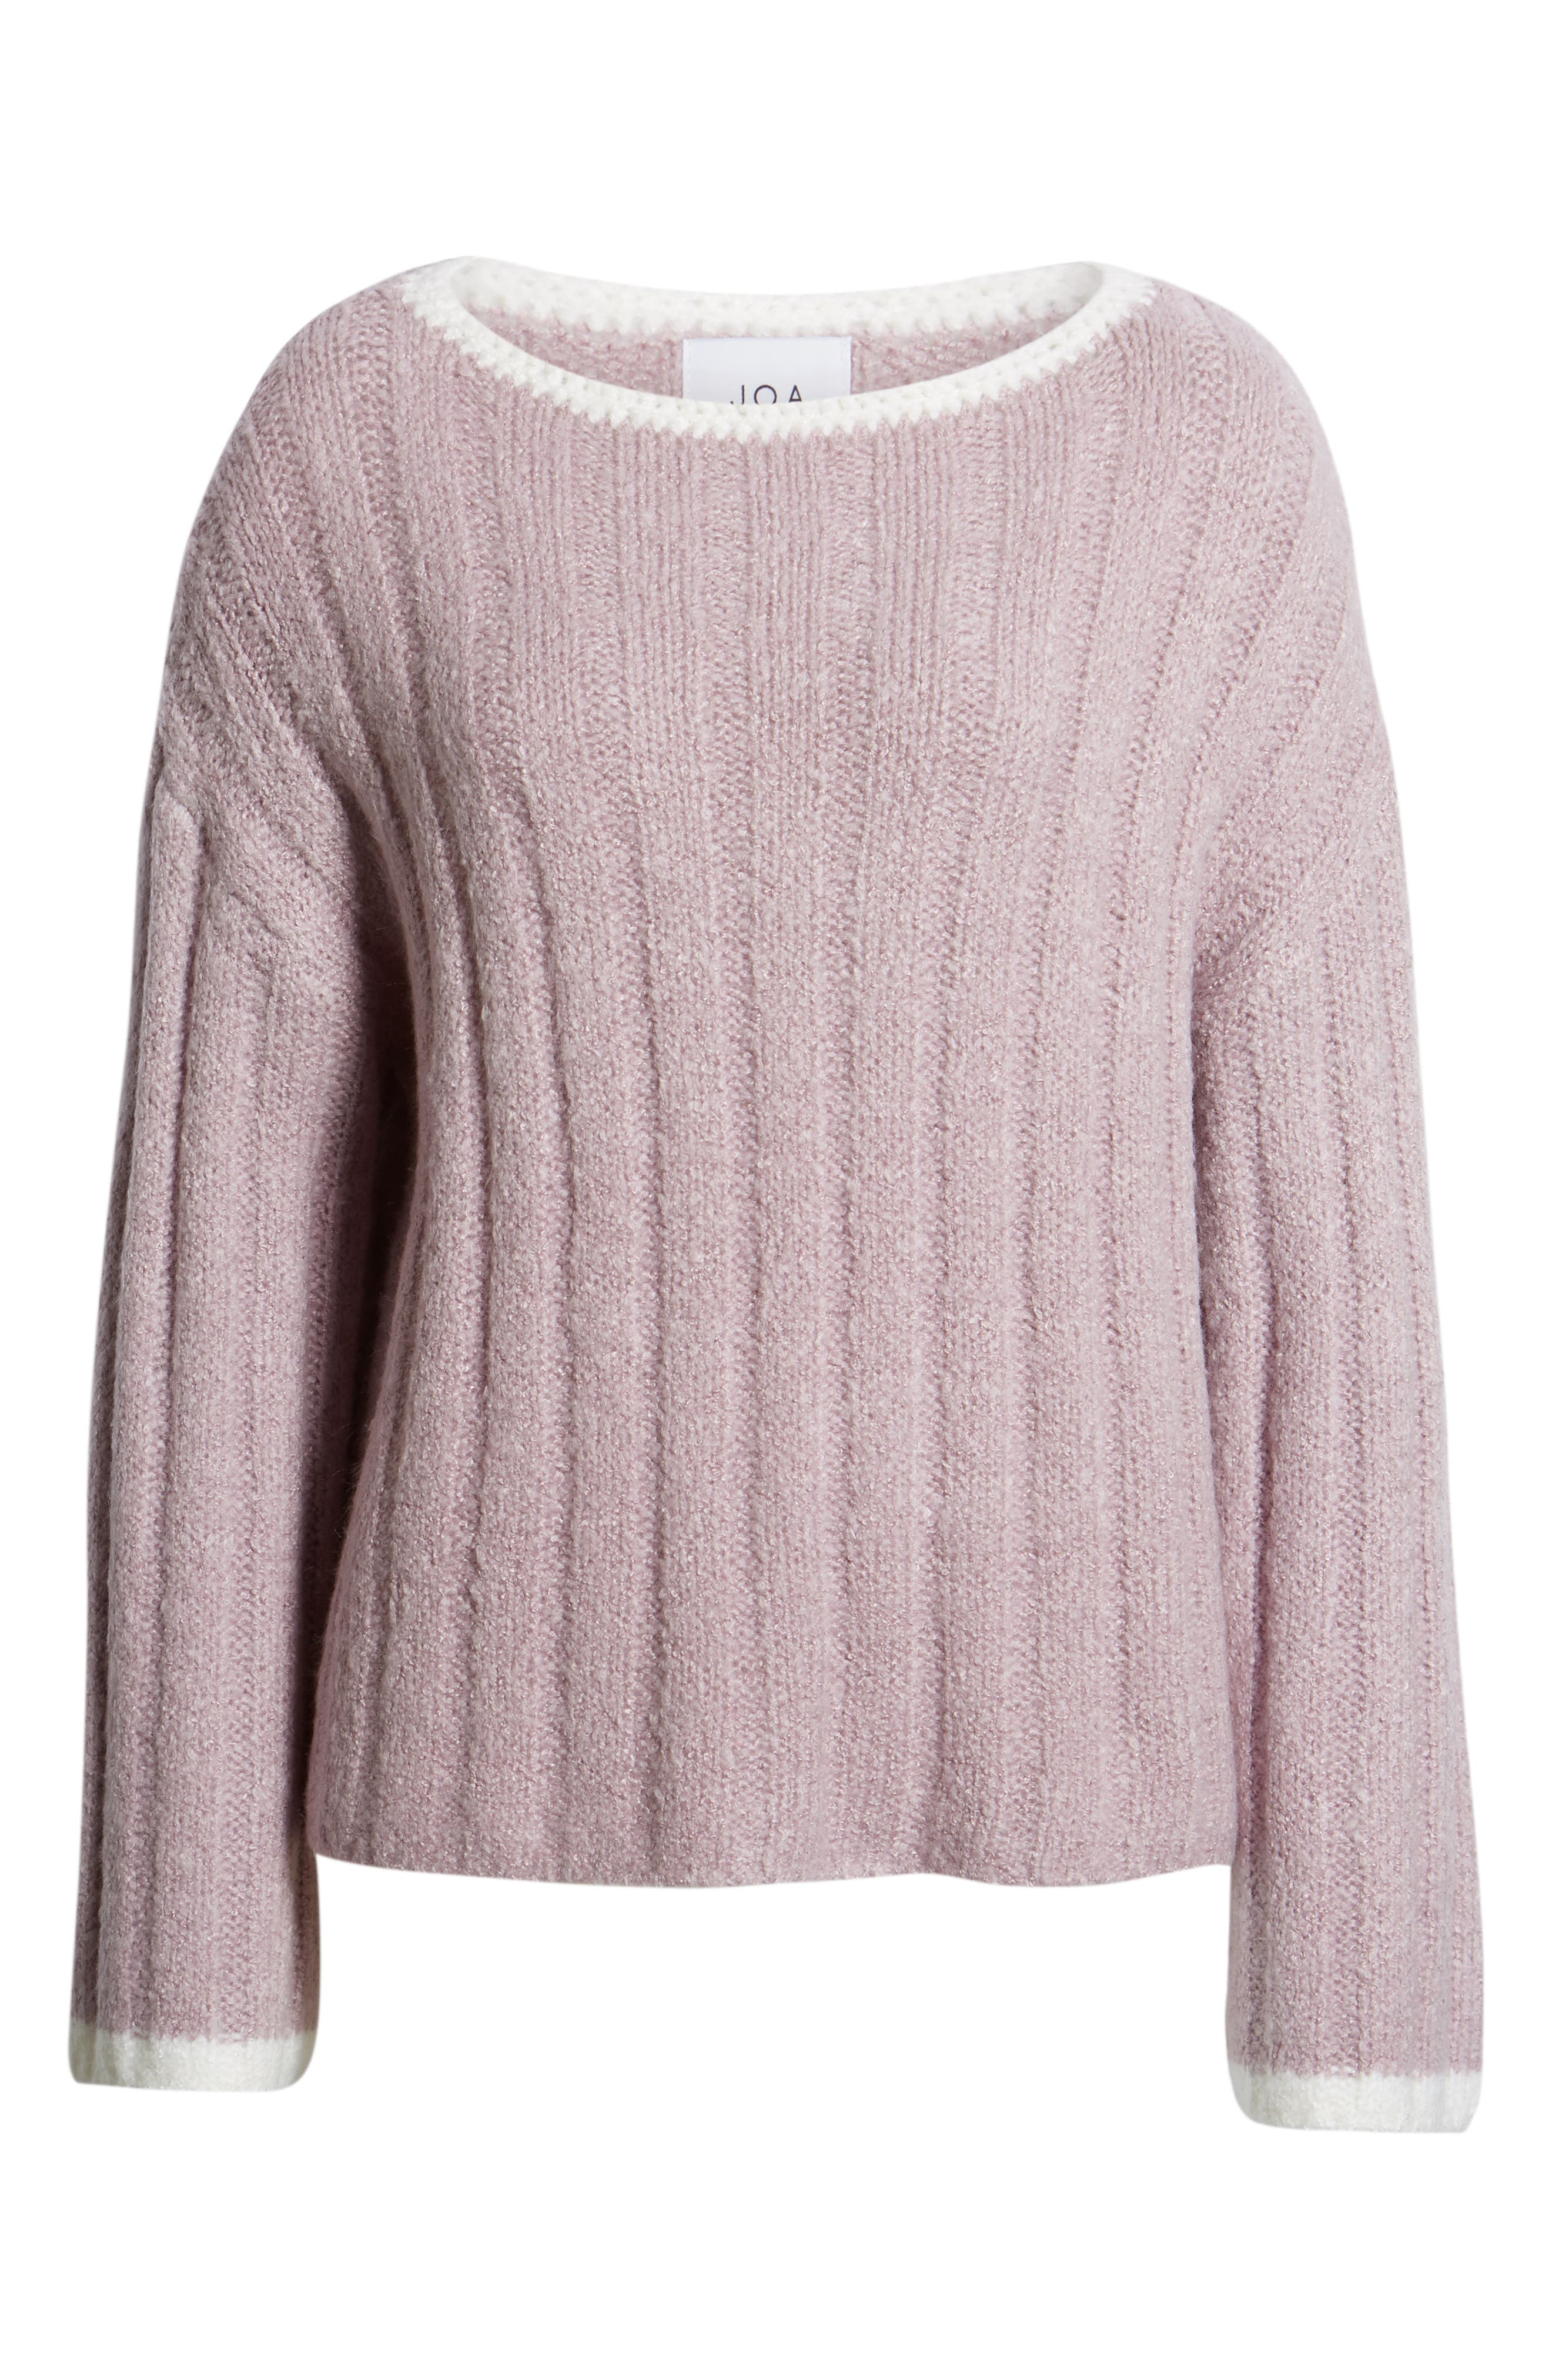 J.O.A., Oversize Sweater, Alternate thumbnail 6, color, LAVENDER